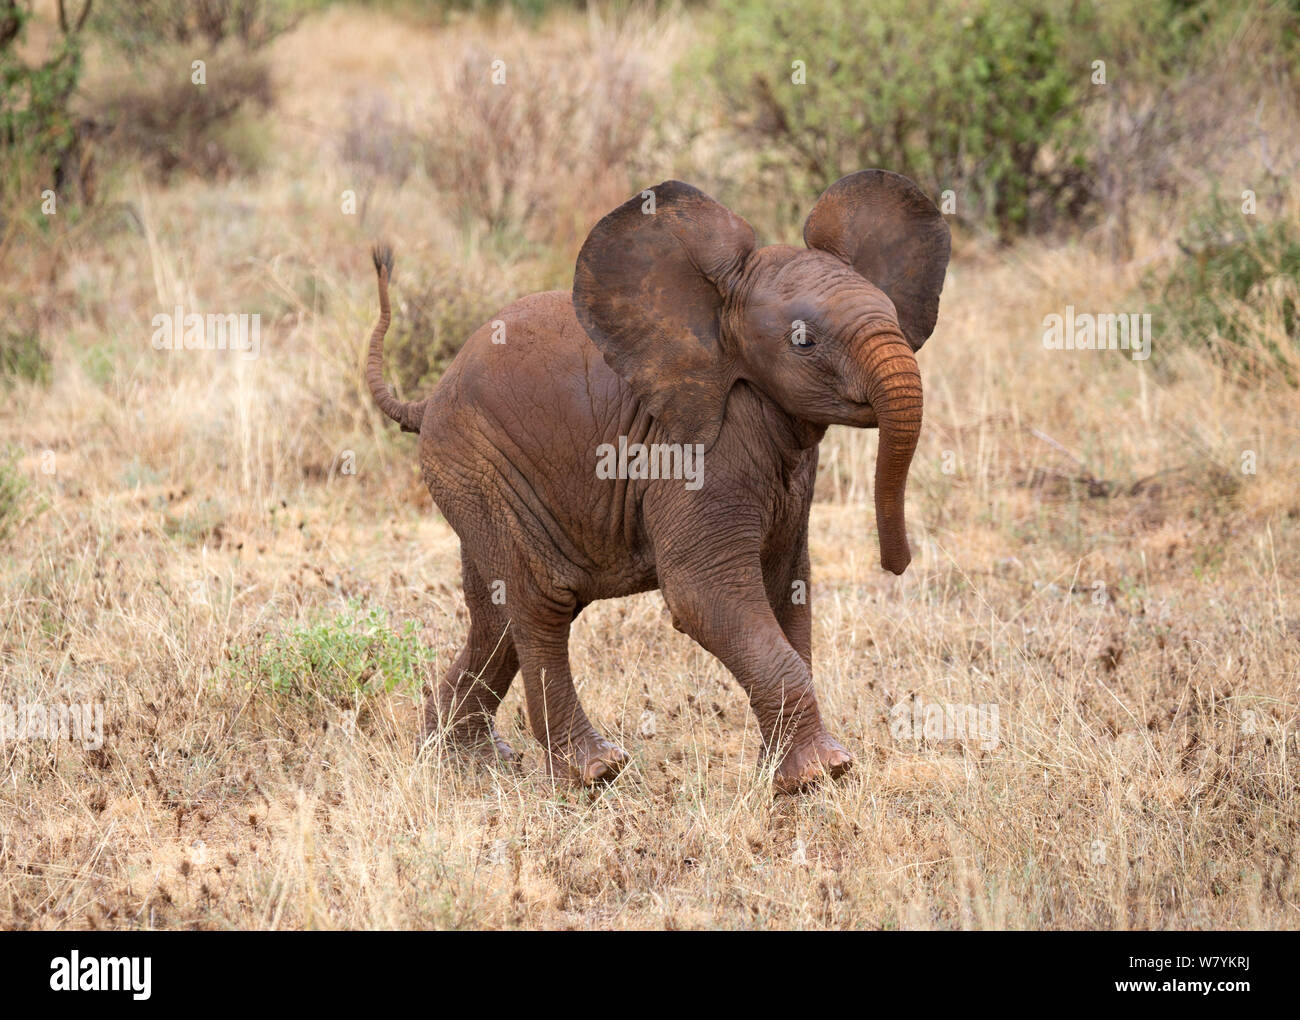 Elephant Running Away Stock Photos & Elephant Running Away